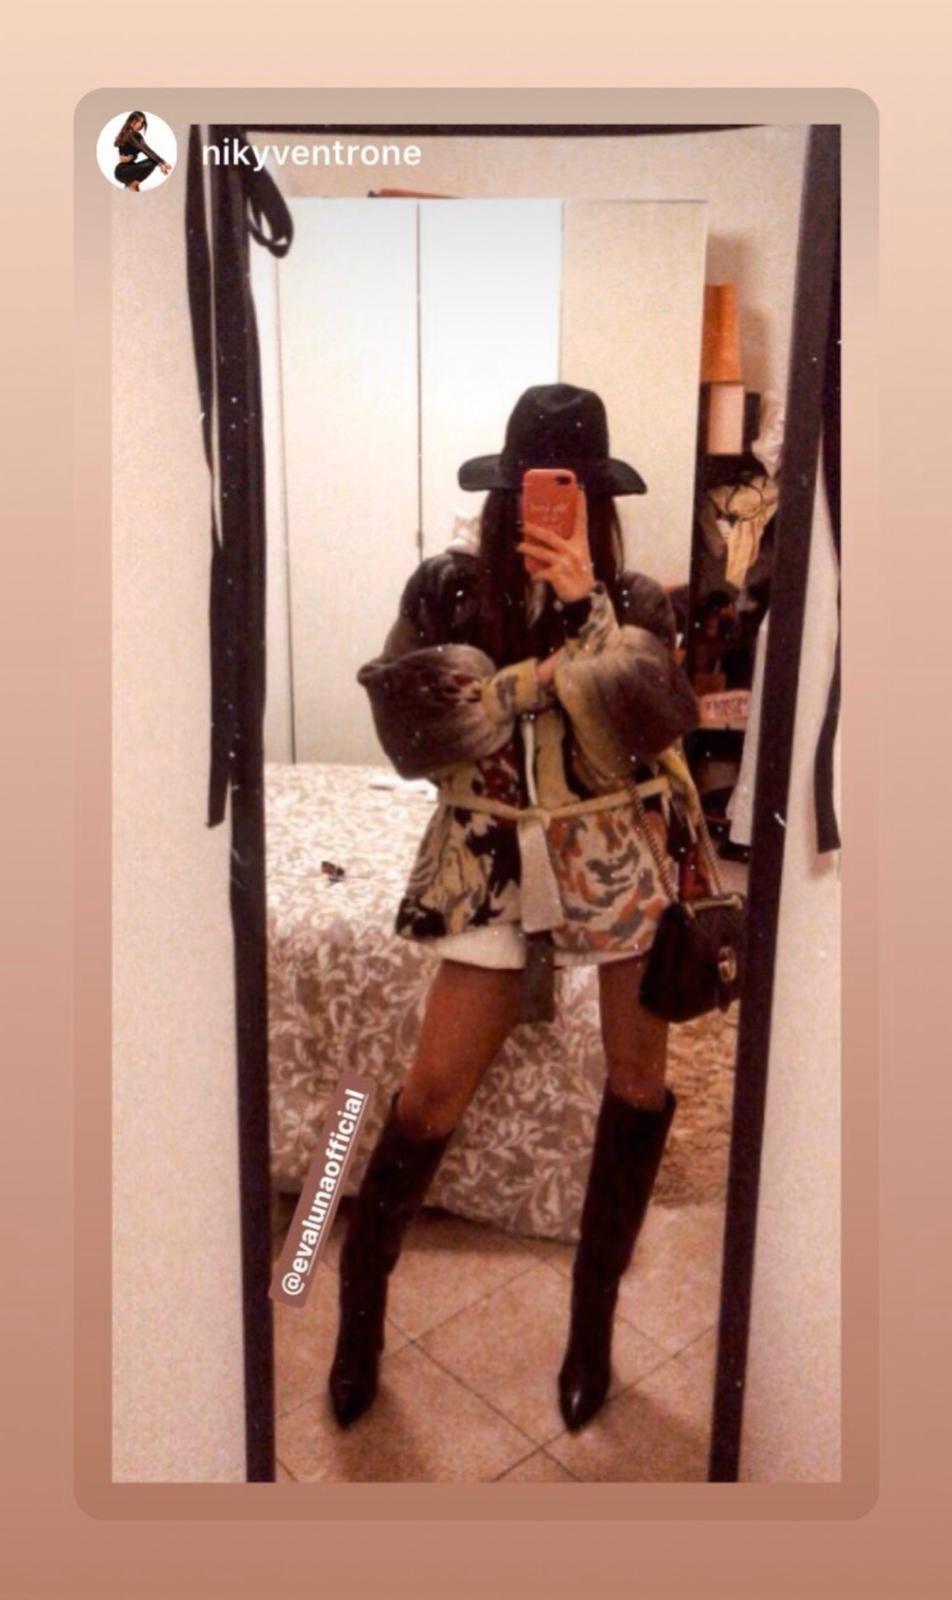 Strong women are like hurricanes: untamable and unattainable! #neversettleforless   #shoestagram #instaheels #instaboots #iloveshoes #designershoes #mensshoes #shoeporn #flatshoes #shoe #fashion #style